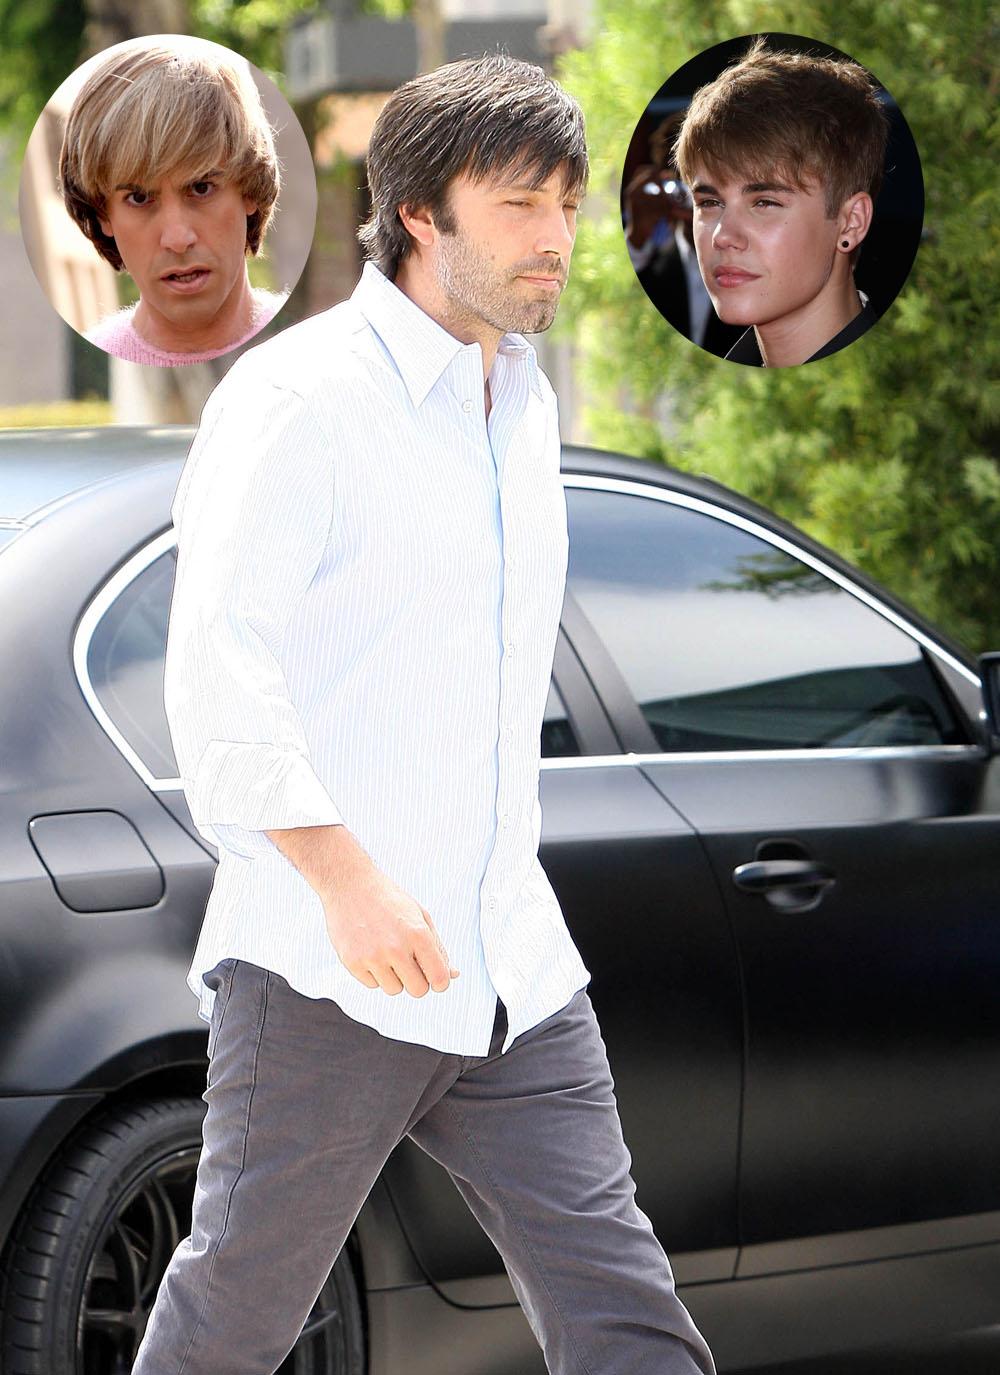 Ben Affleck hair watch, more Bieber or Bruno?